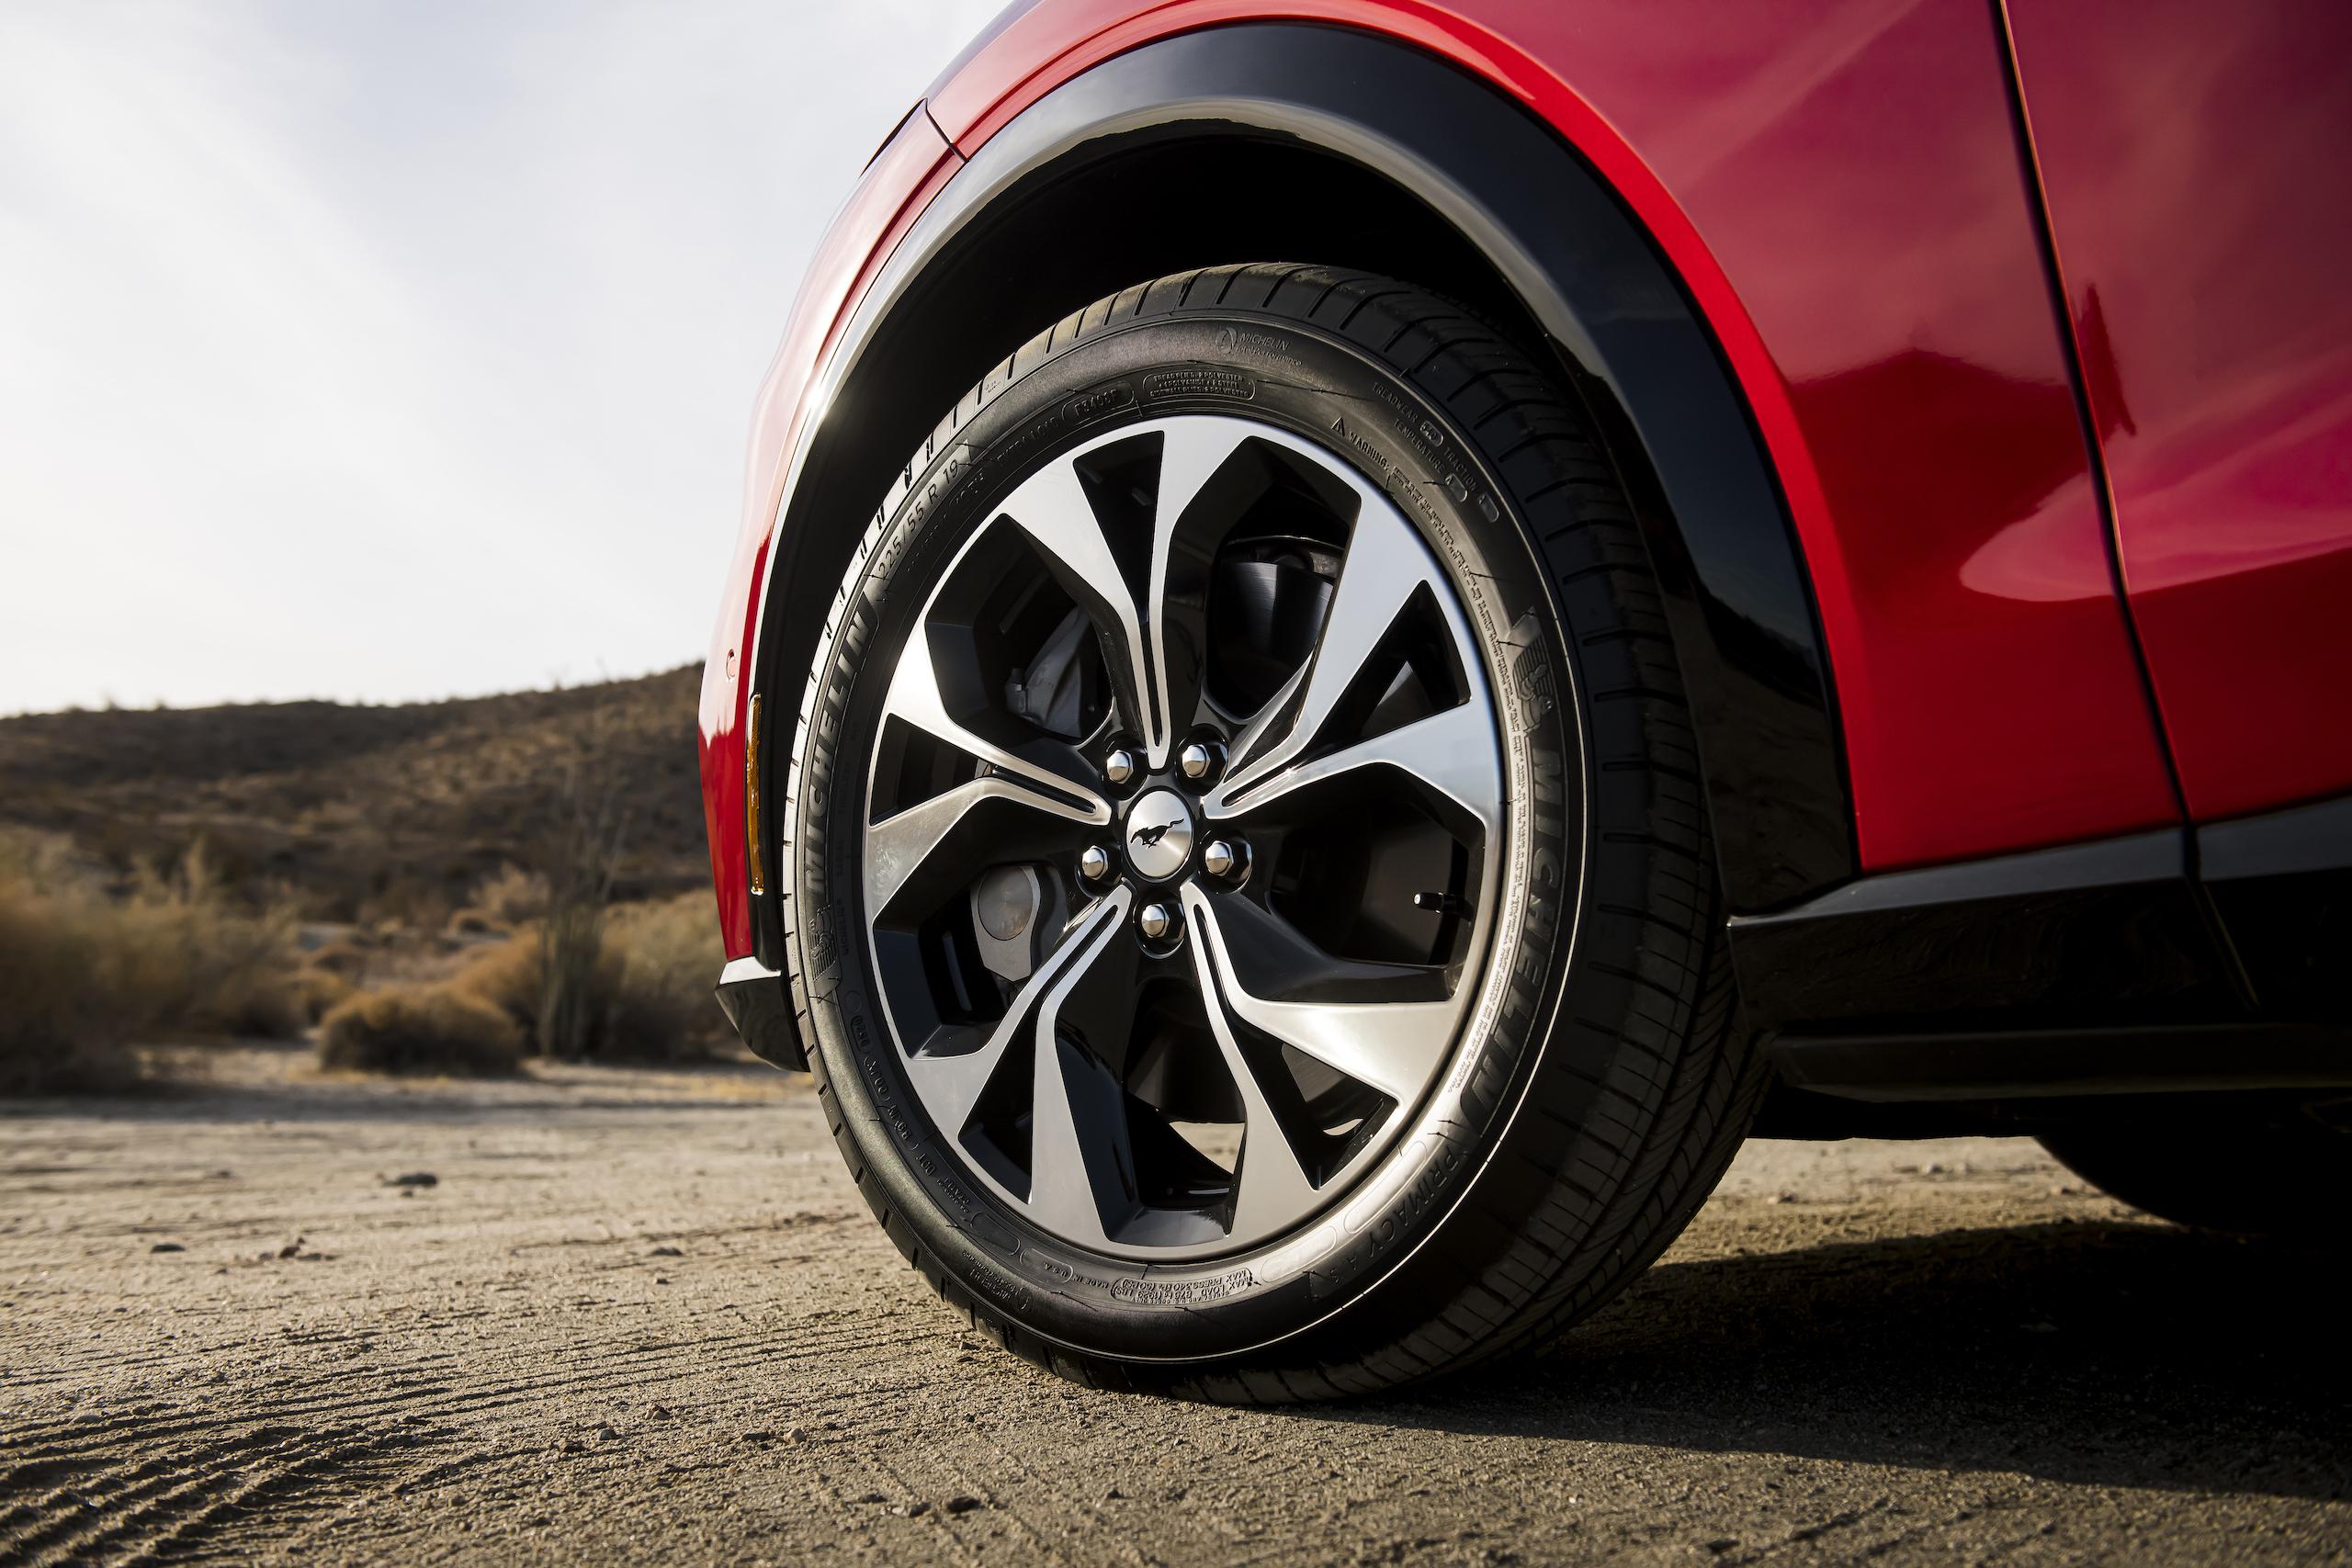 Mustang Mach-E front wheel detail